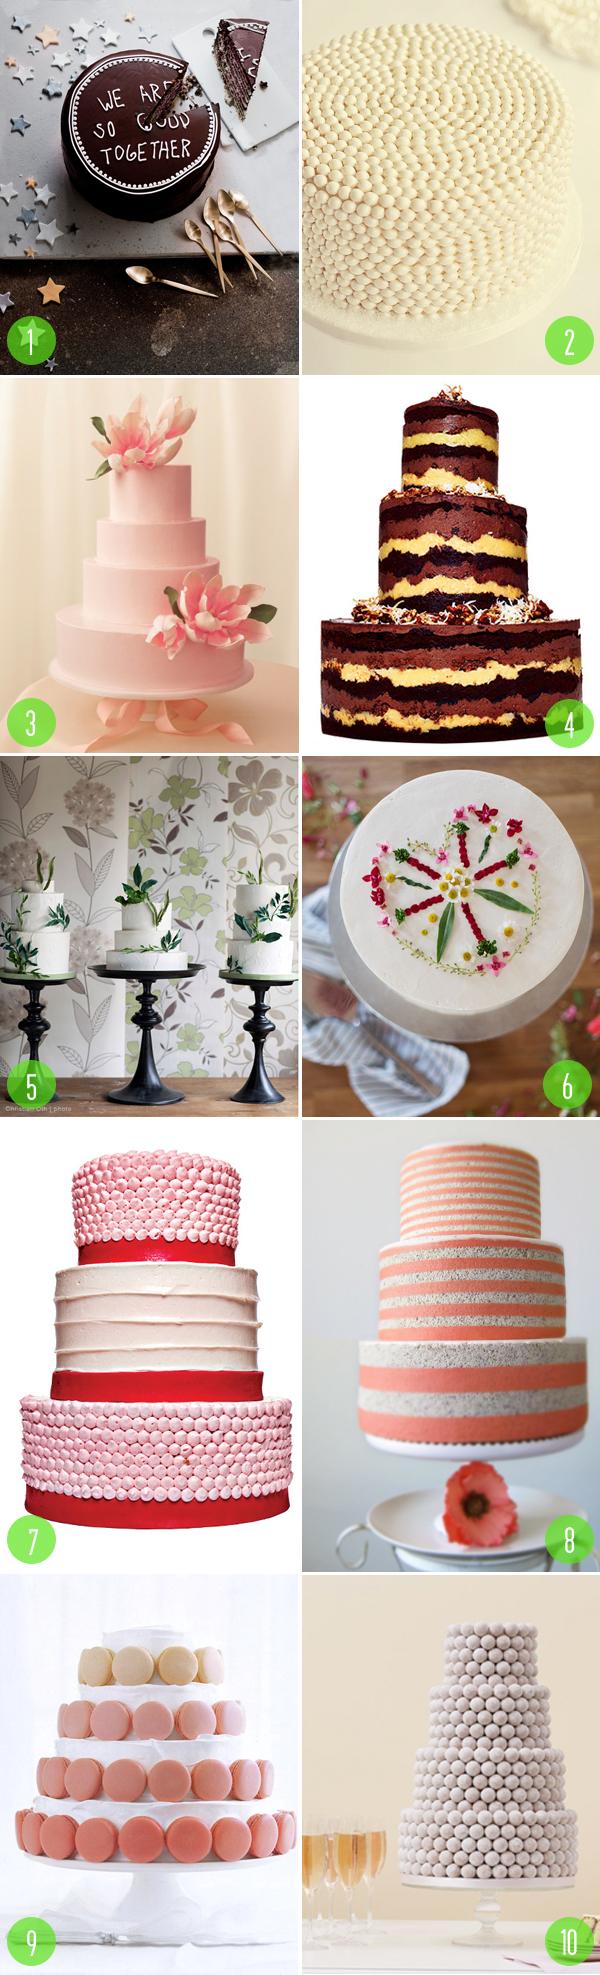 top 10: nonfondant cakes